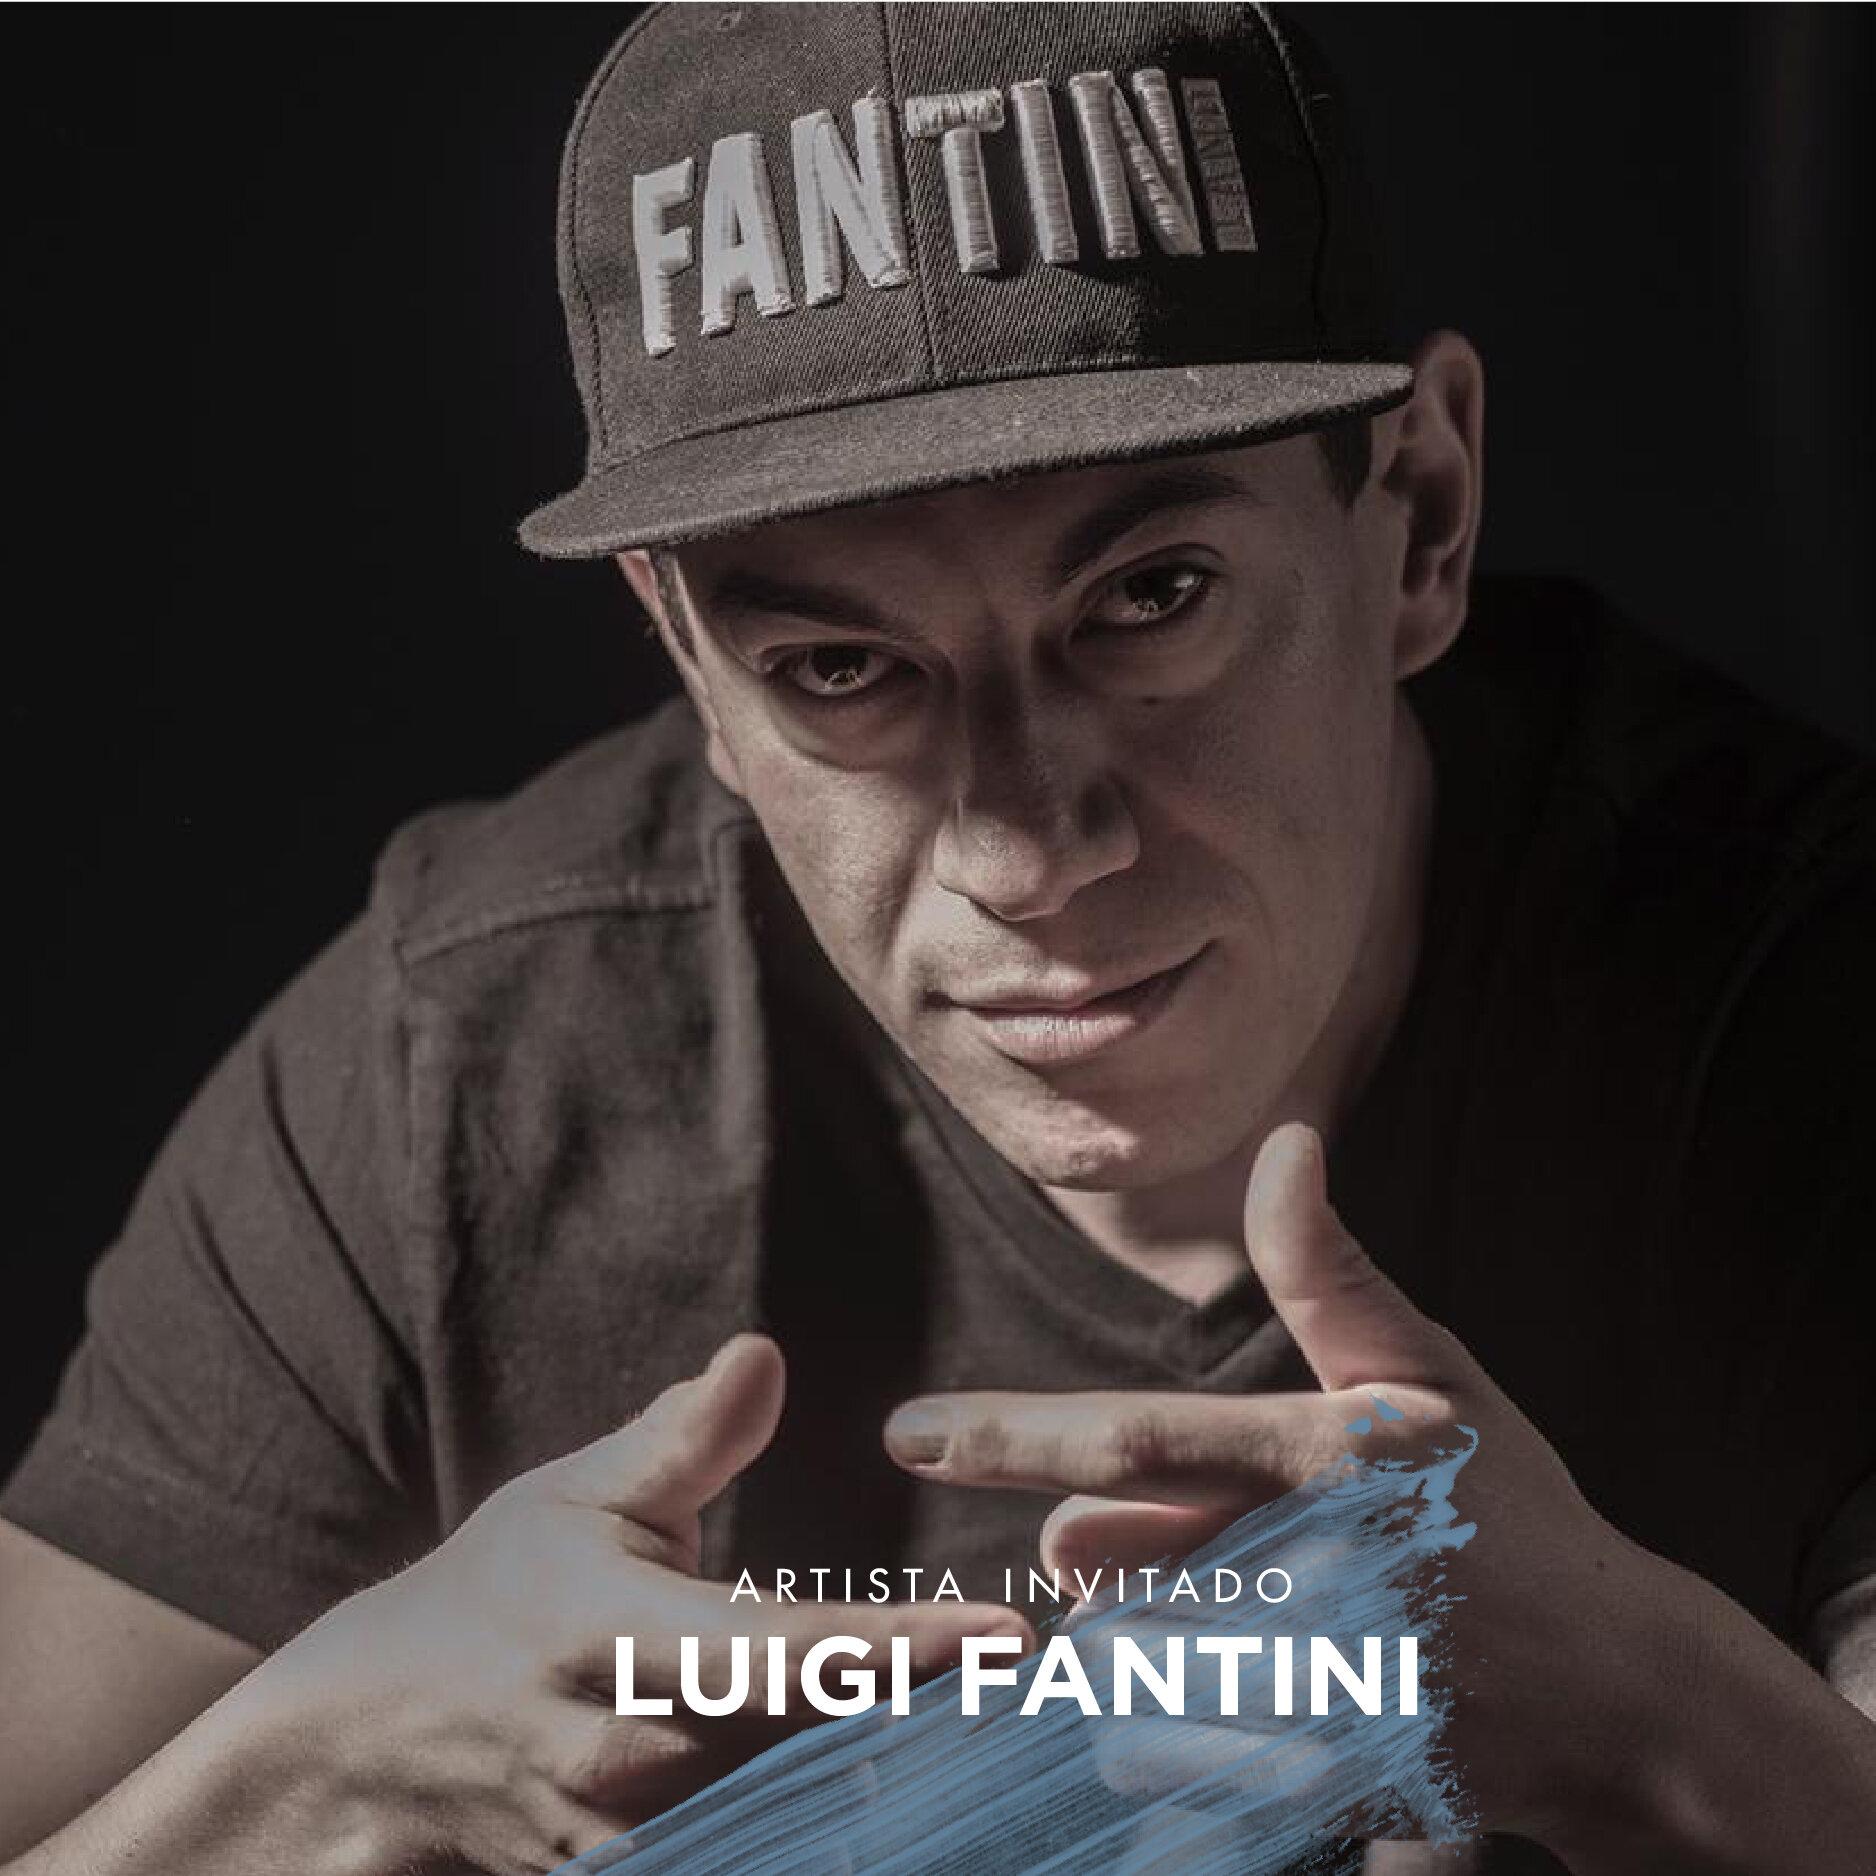 Fantini-02.jpg